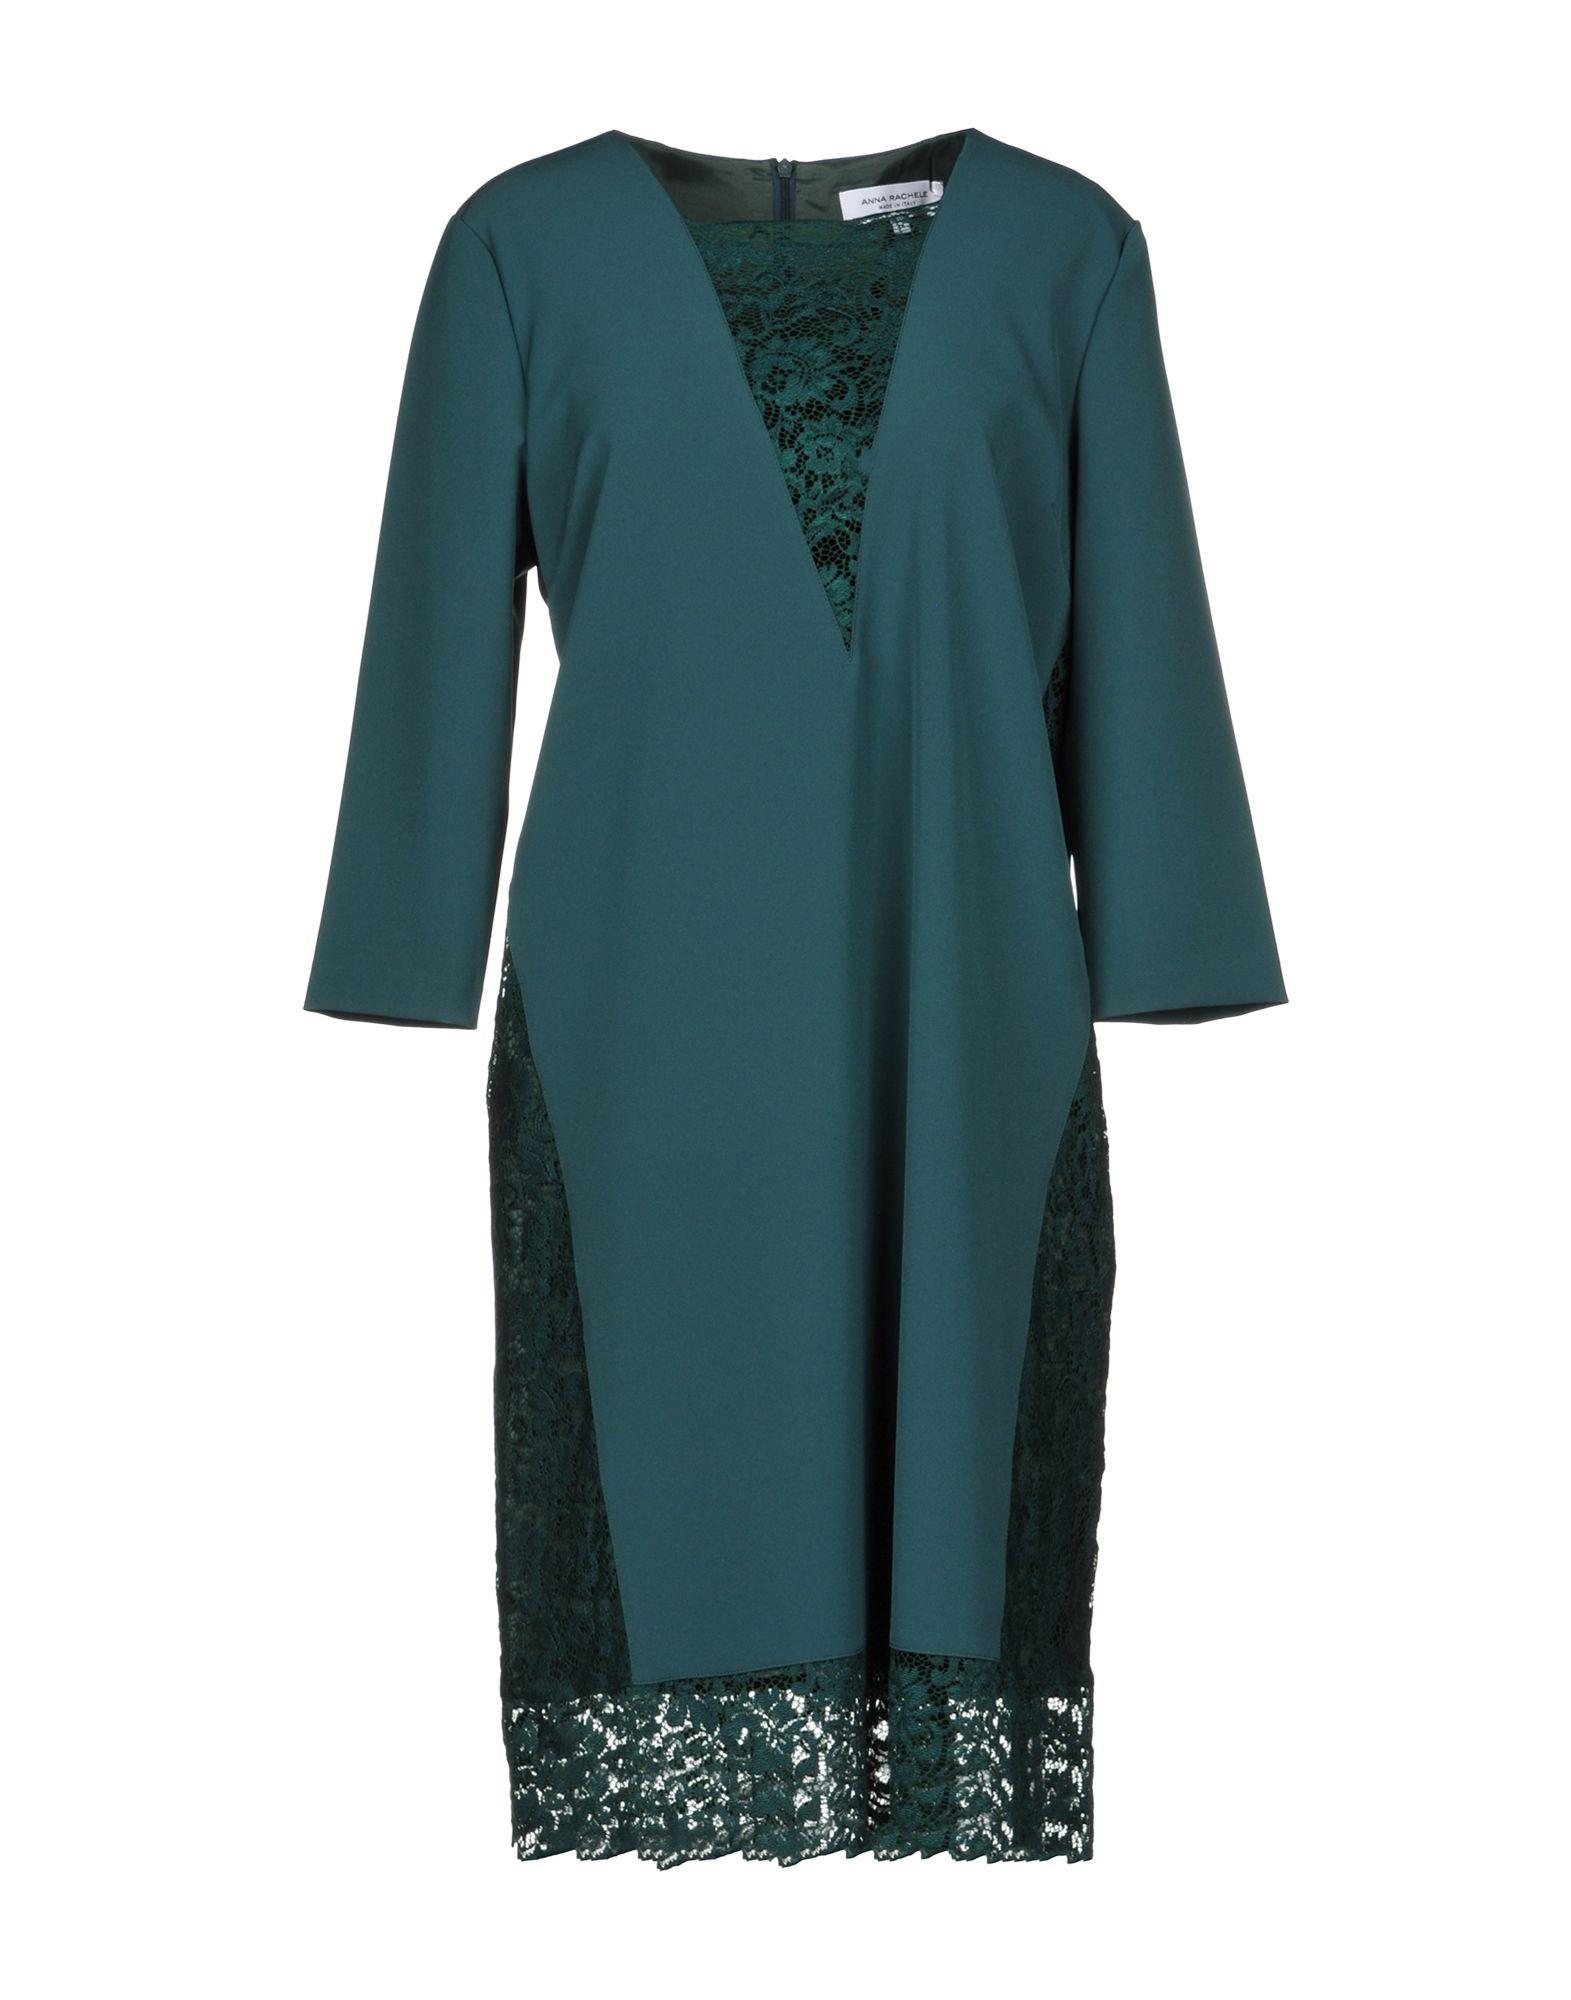 ANNA RACHELE Damen Kurzes Kleid Farbe Grün Größe 7